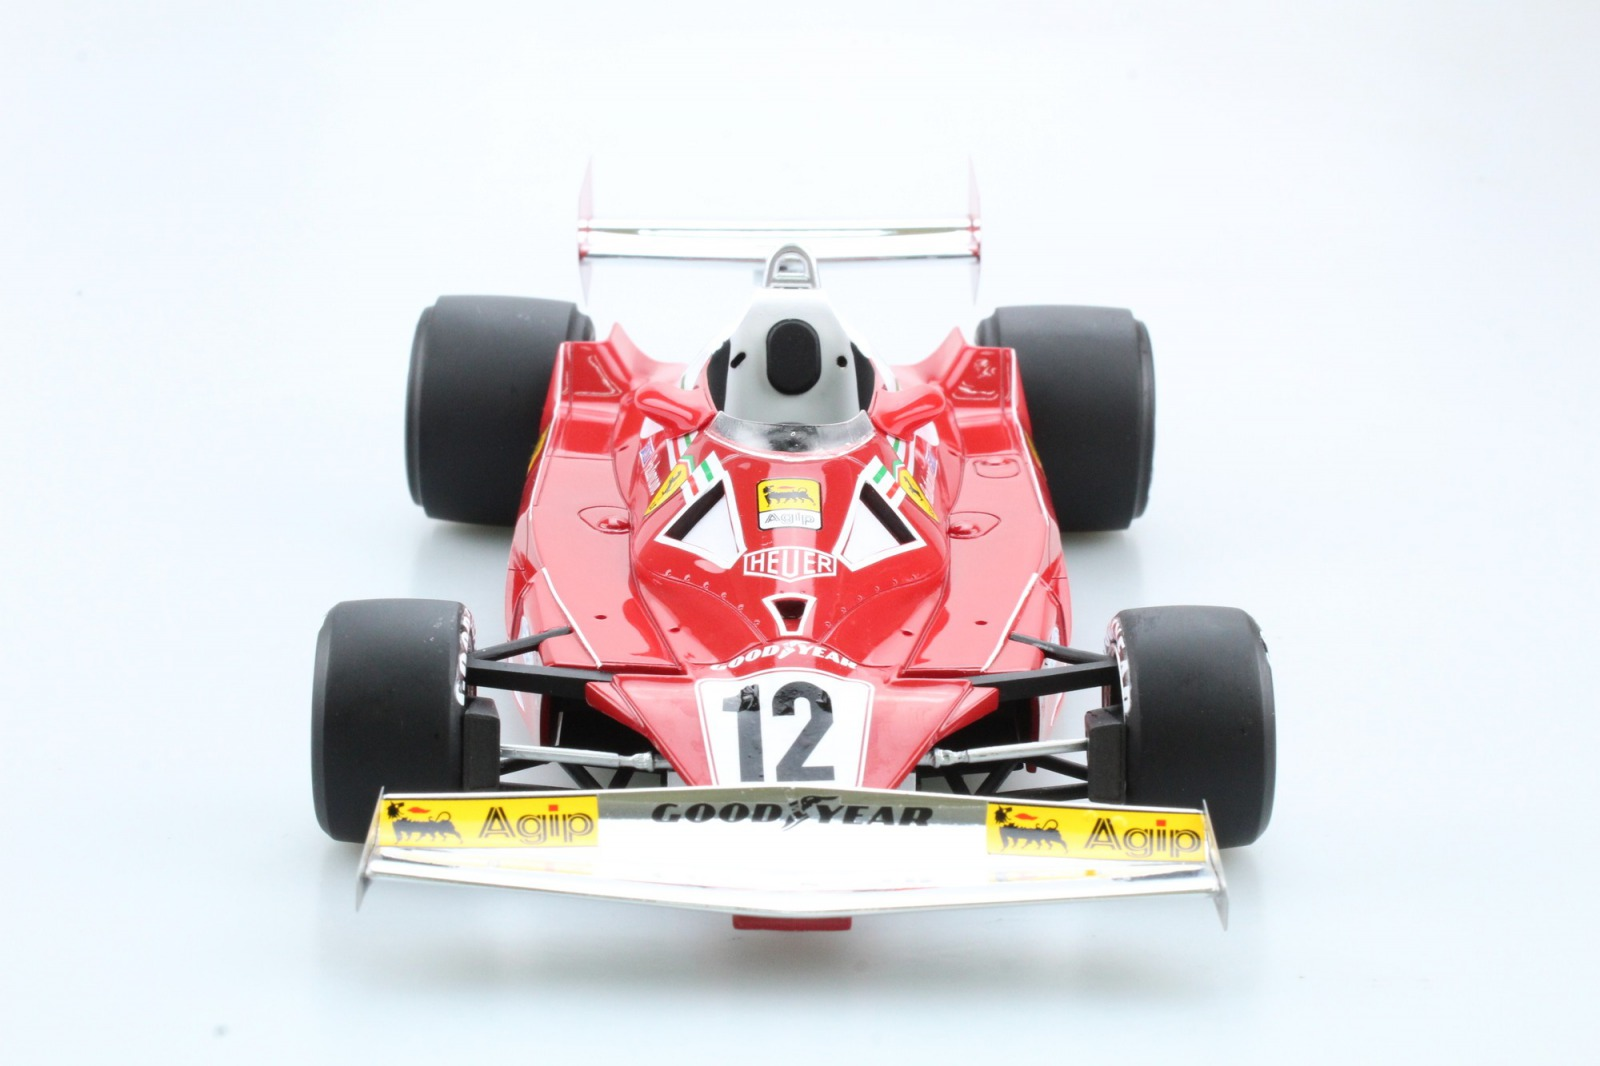 GP Replicas 1/18 ミニカー レジン・プロポーションモデル 1977年シーズン フェラーリ F1 312 T2 No.12 カルロス ロイテマンFERRARI - F1 312T2 N 12 SEASON 1977 C.REUTEMANN 1:18 GP Replicas